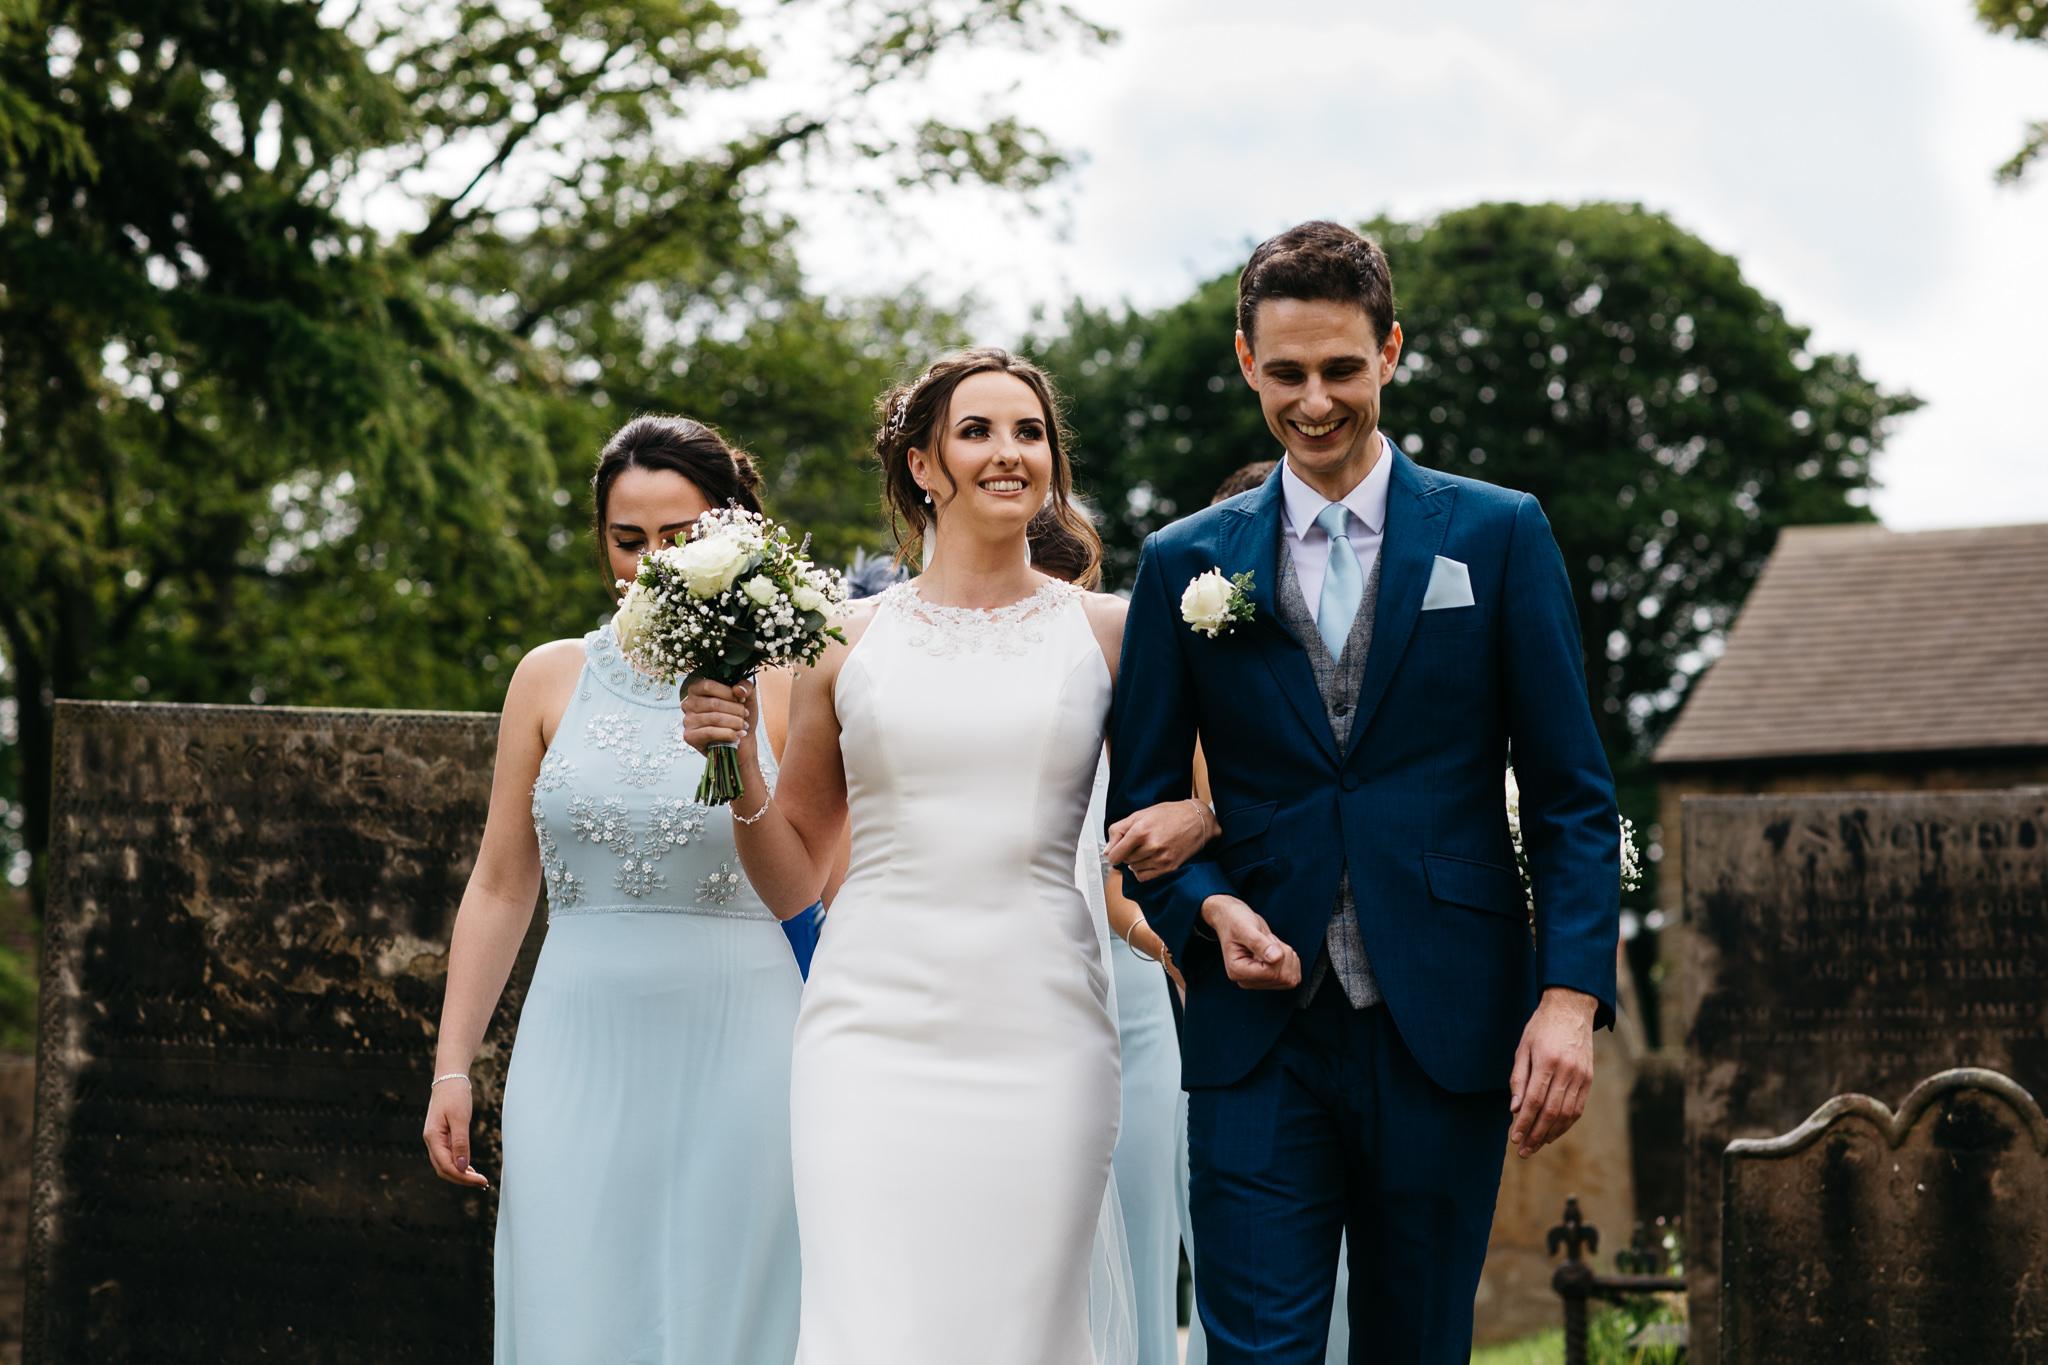 Sheffield_Wedding_Photographer (17 of 44)